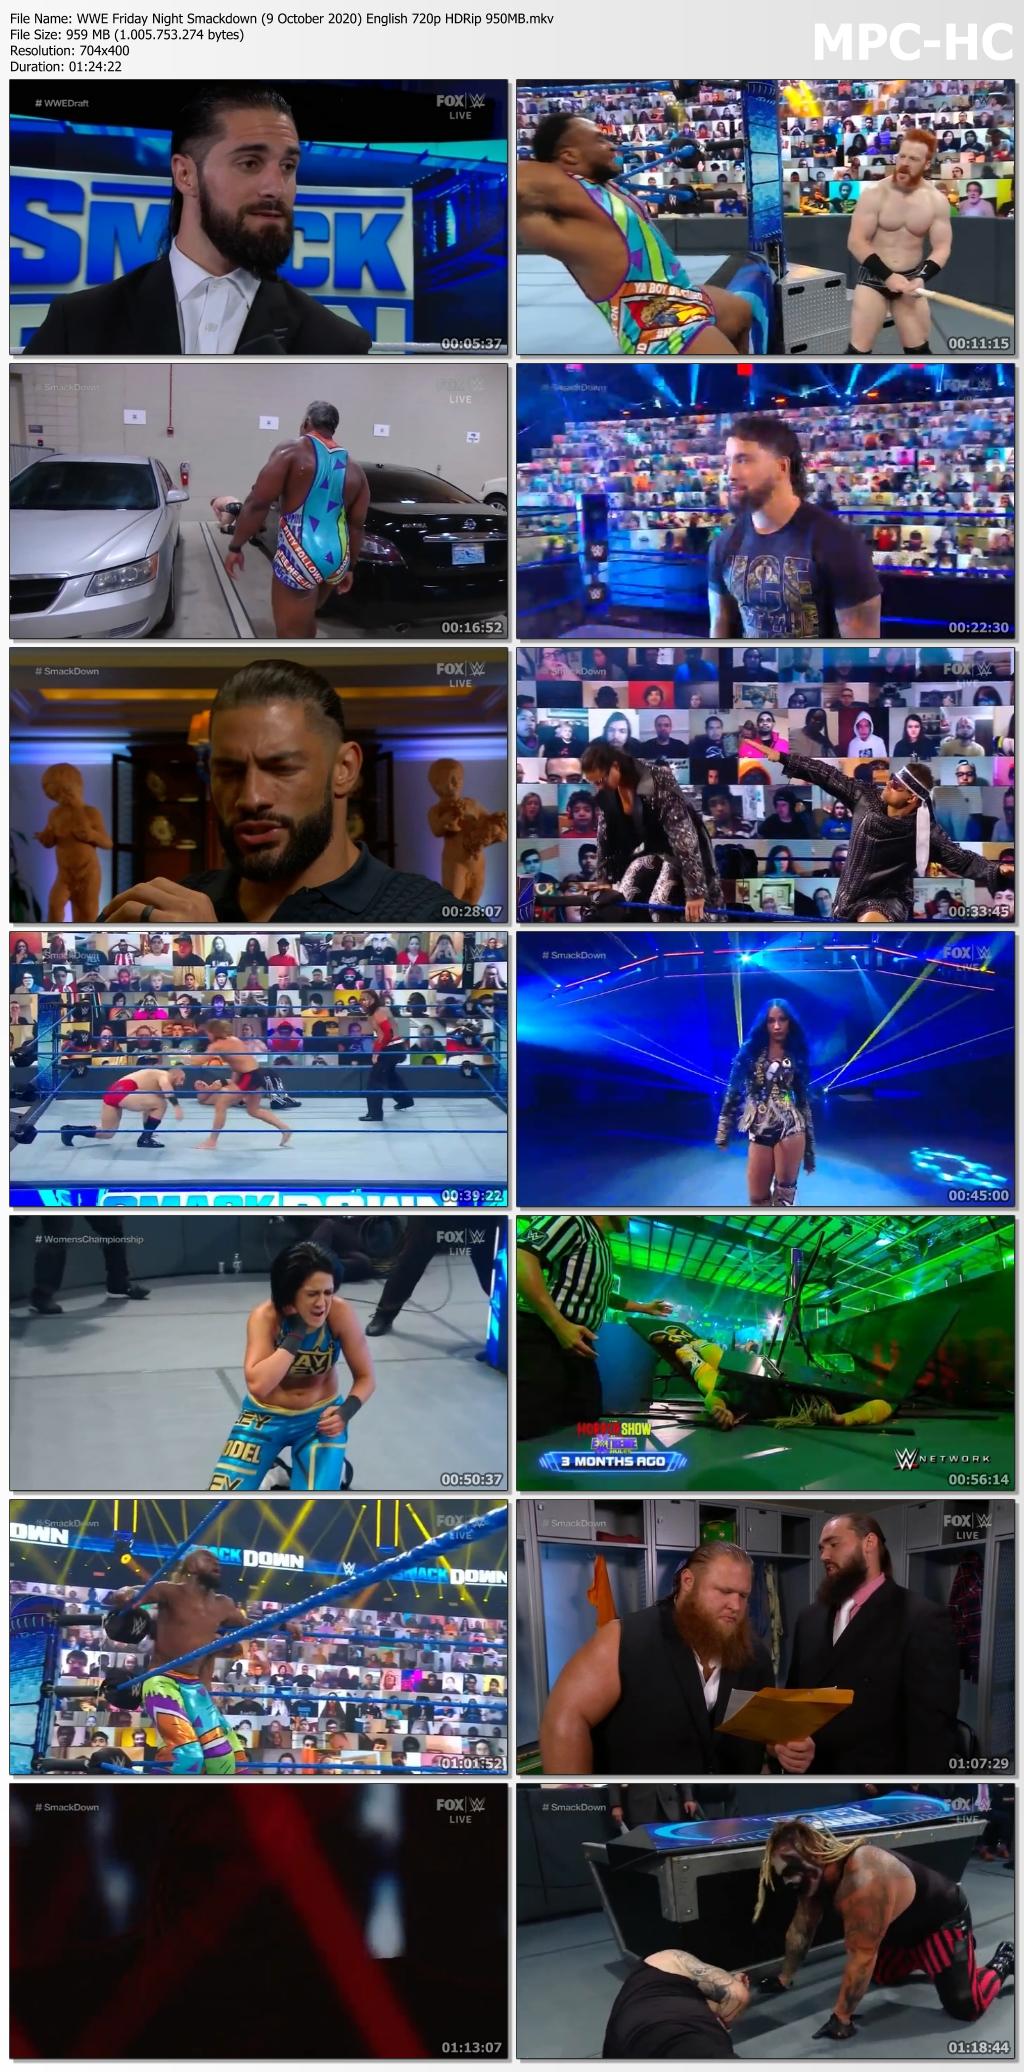 WWE-Friday-Night-Smackdown-9-October-2020-English-720p-HDRip-950-MB-mkv-thumbs